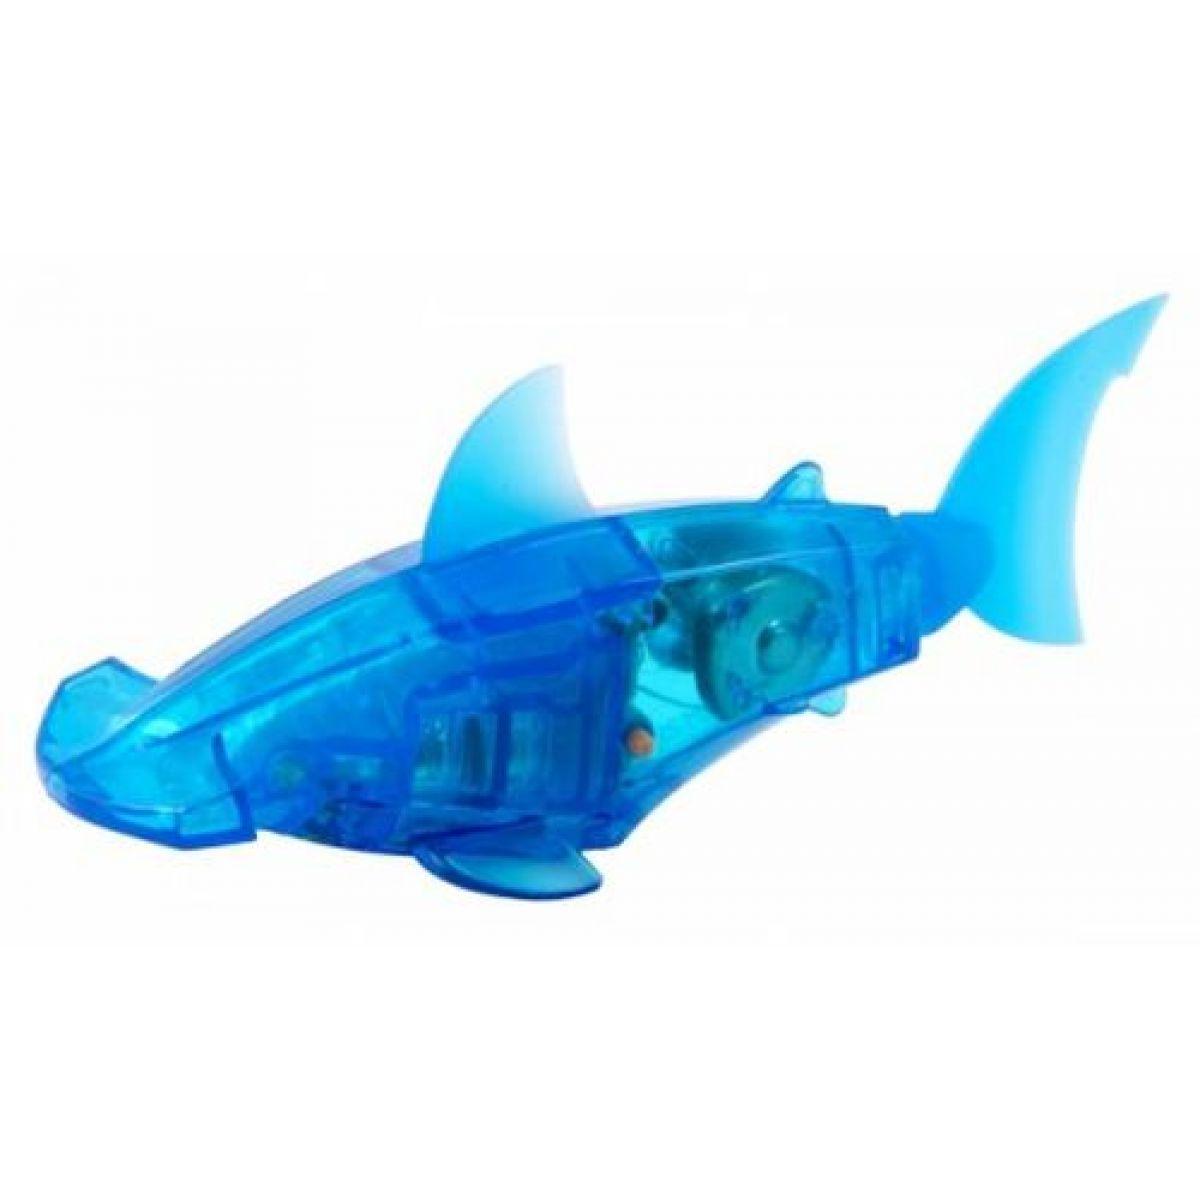 Hexbug Aquabot Led - Kladivoun modrý